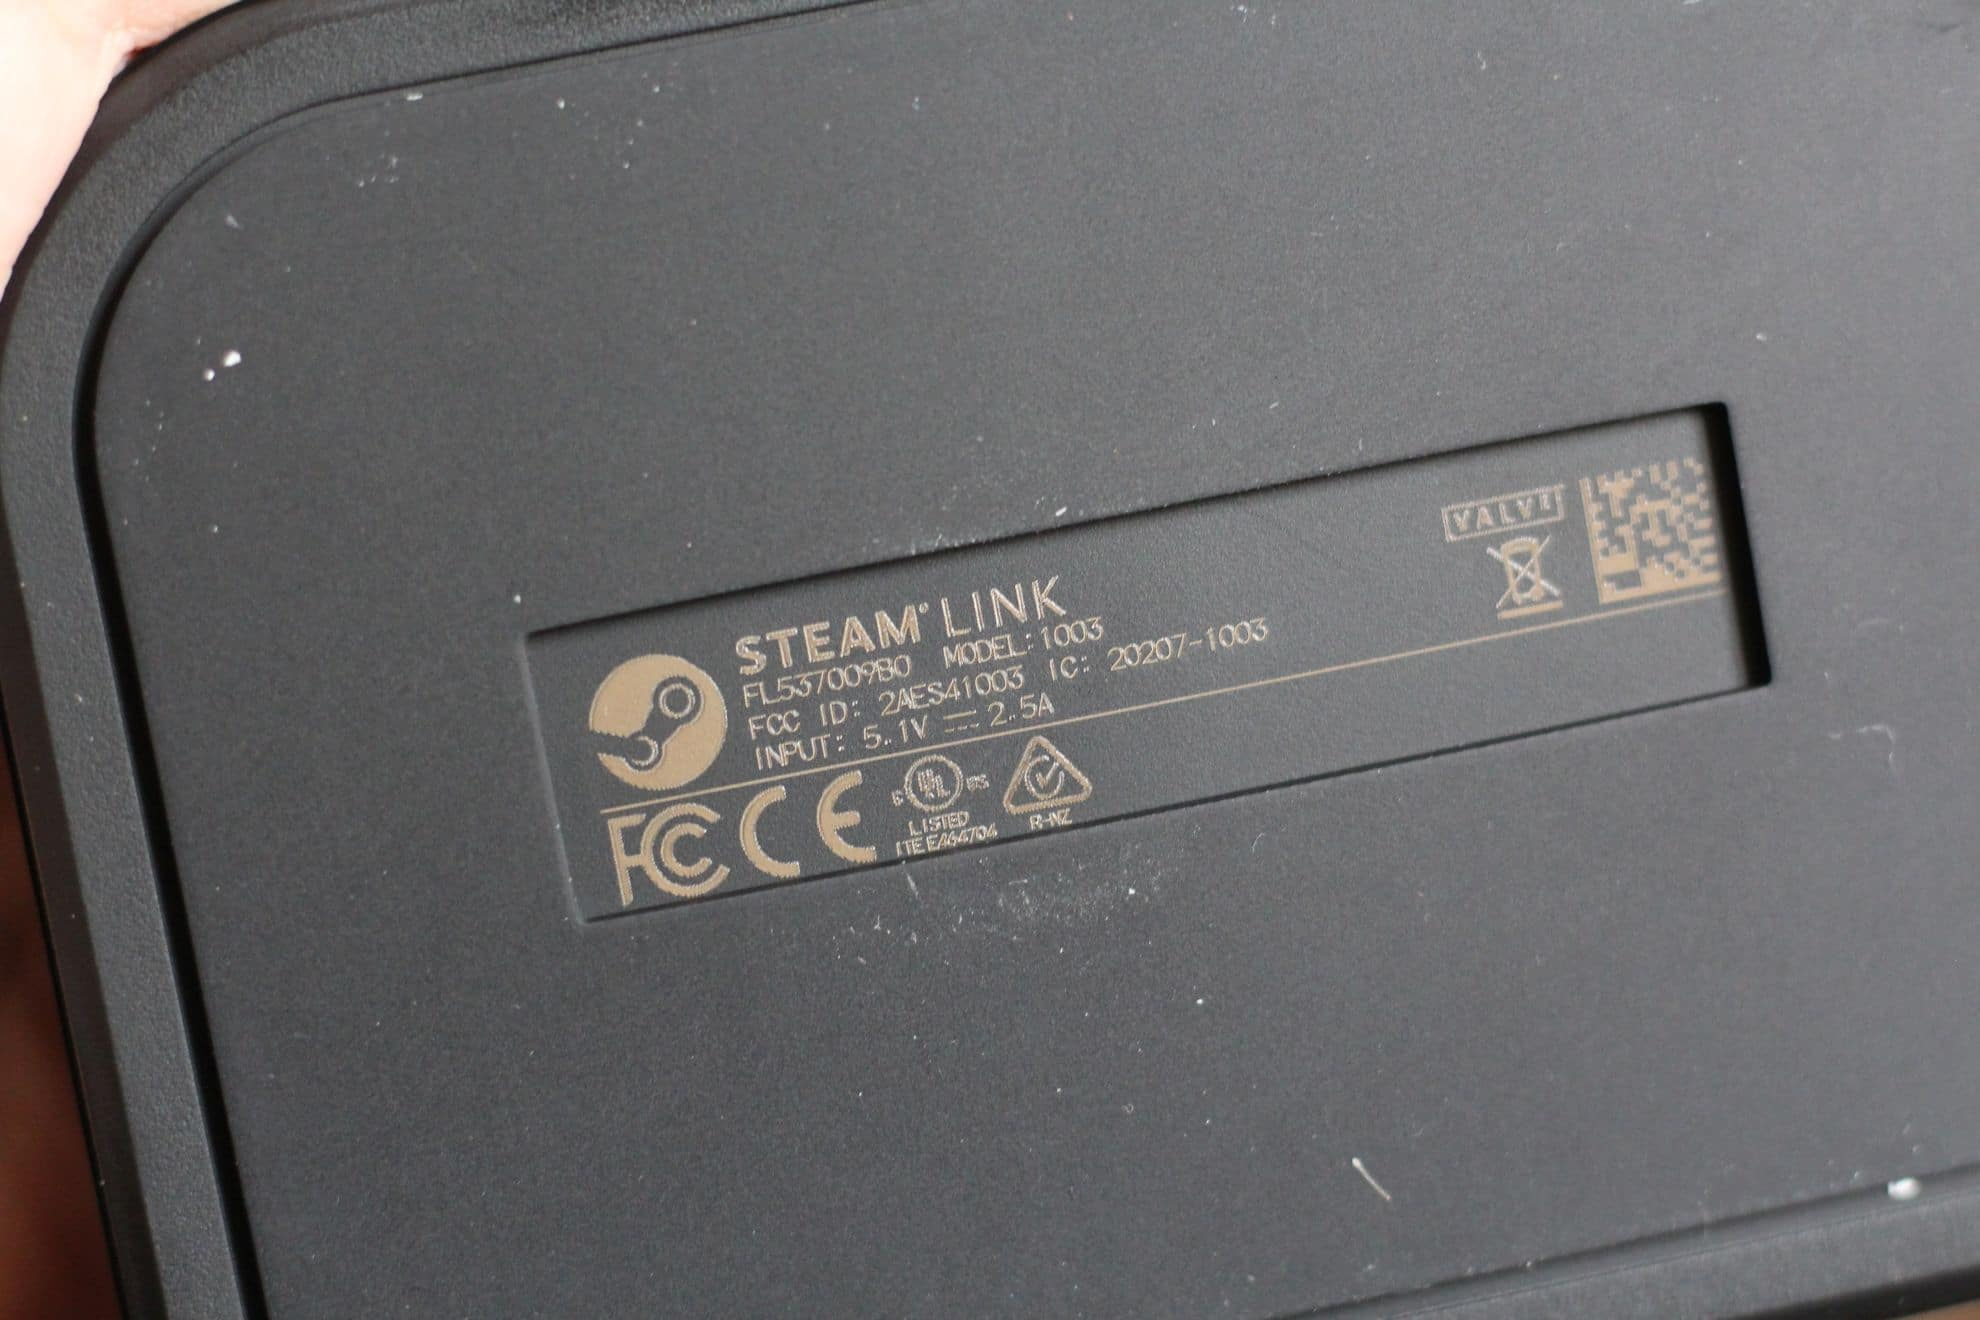 Braucht dann noch jemand Steam Link? (Foto: Sven Wernicke / GamingGadgets.de)